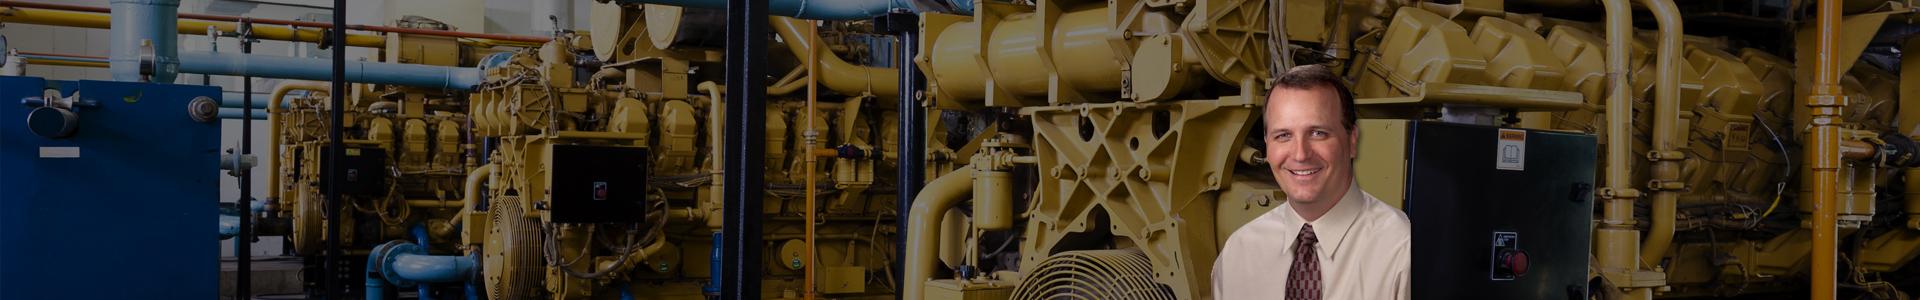 Generator Specialist